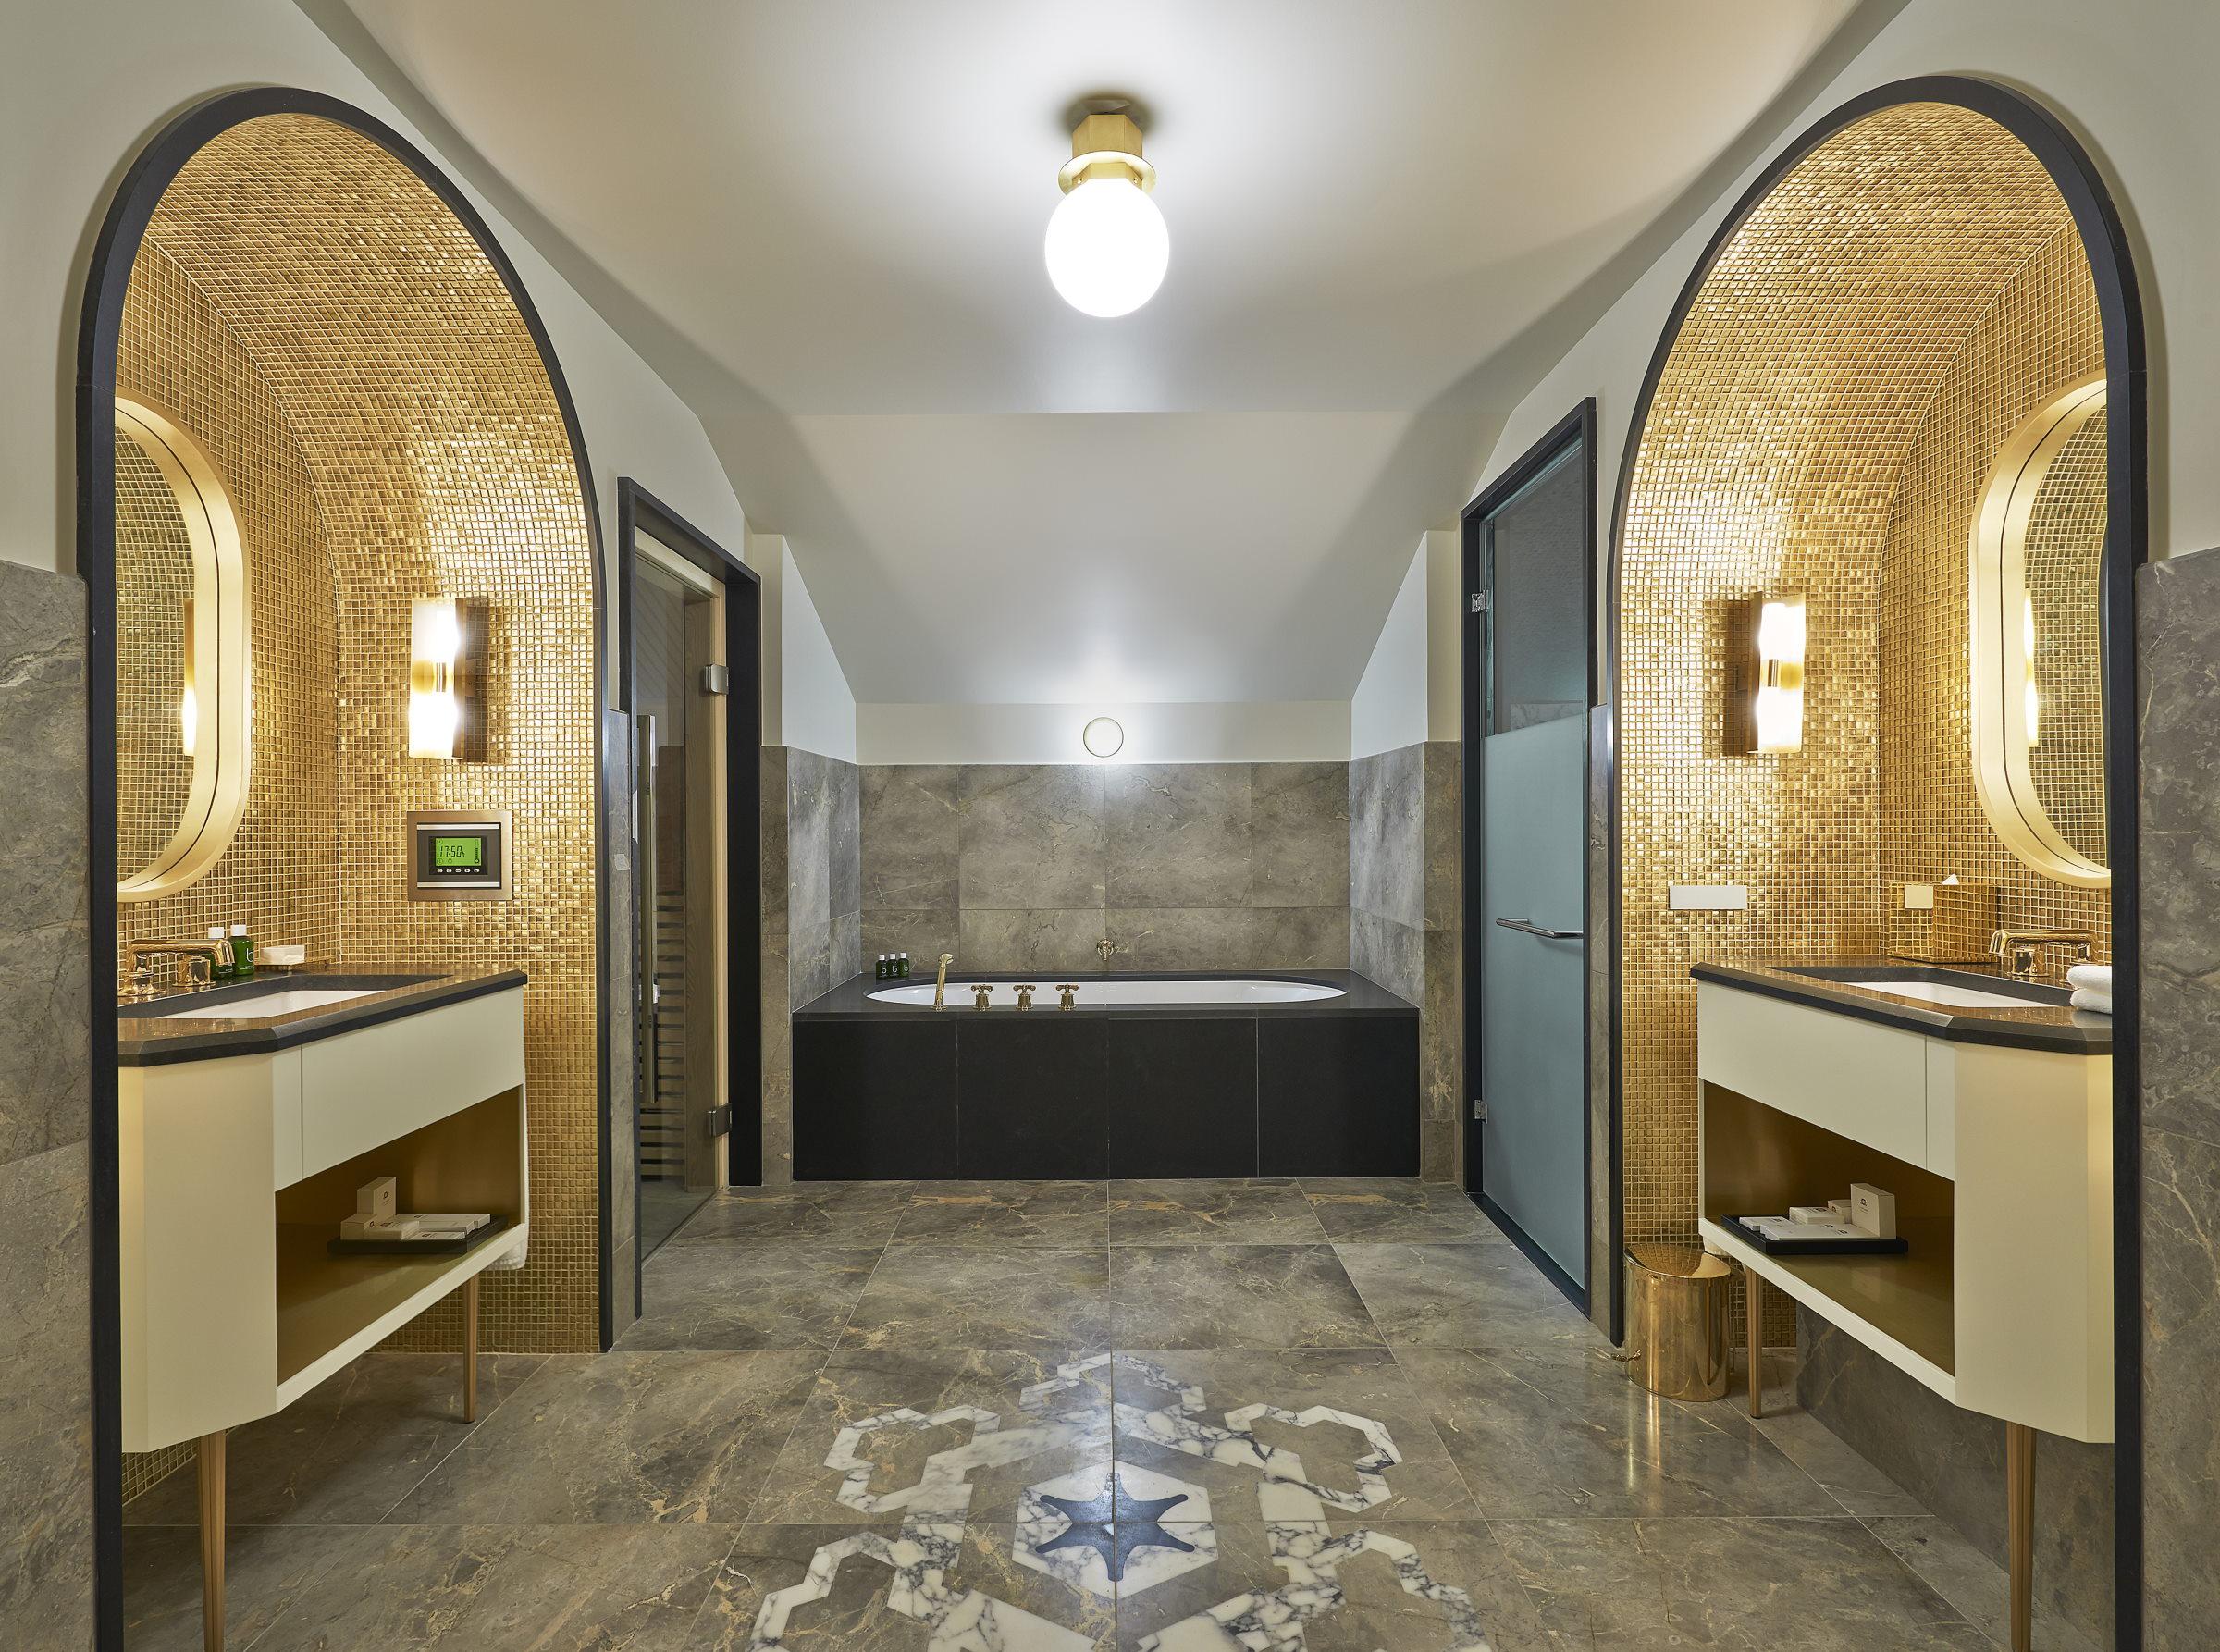 Making A Splash: Most Luxurious Hotel Bathrooms